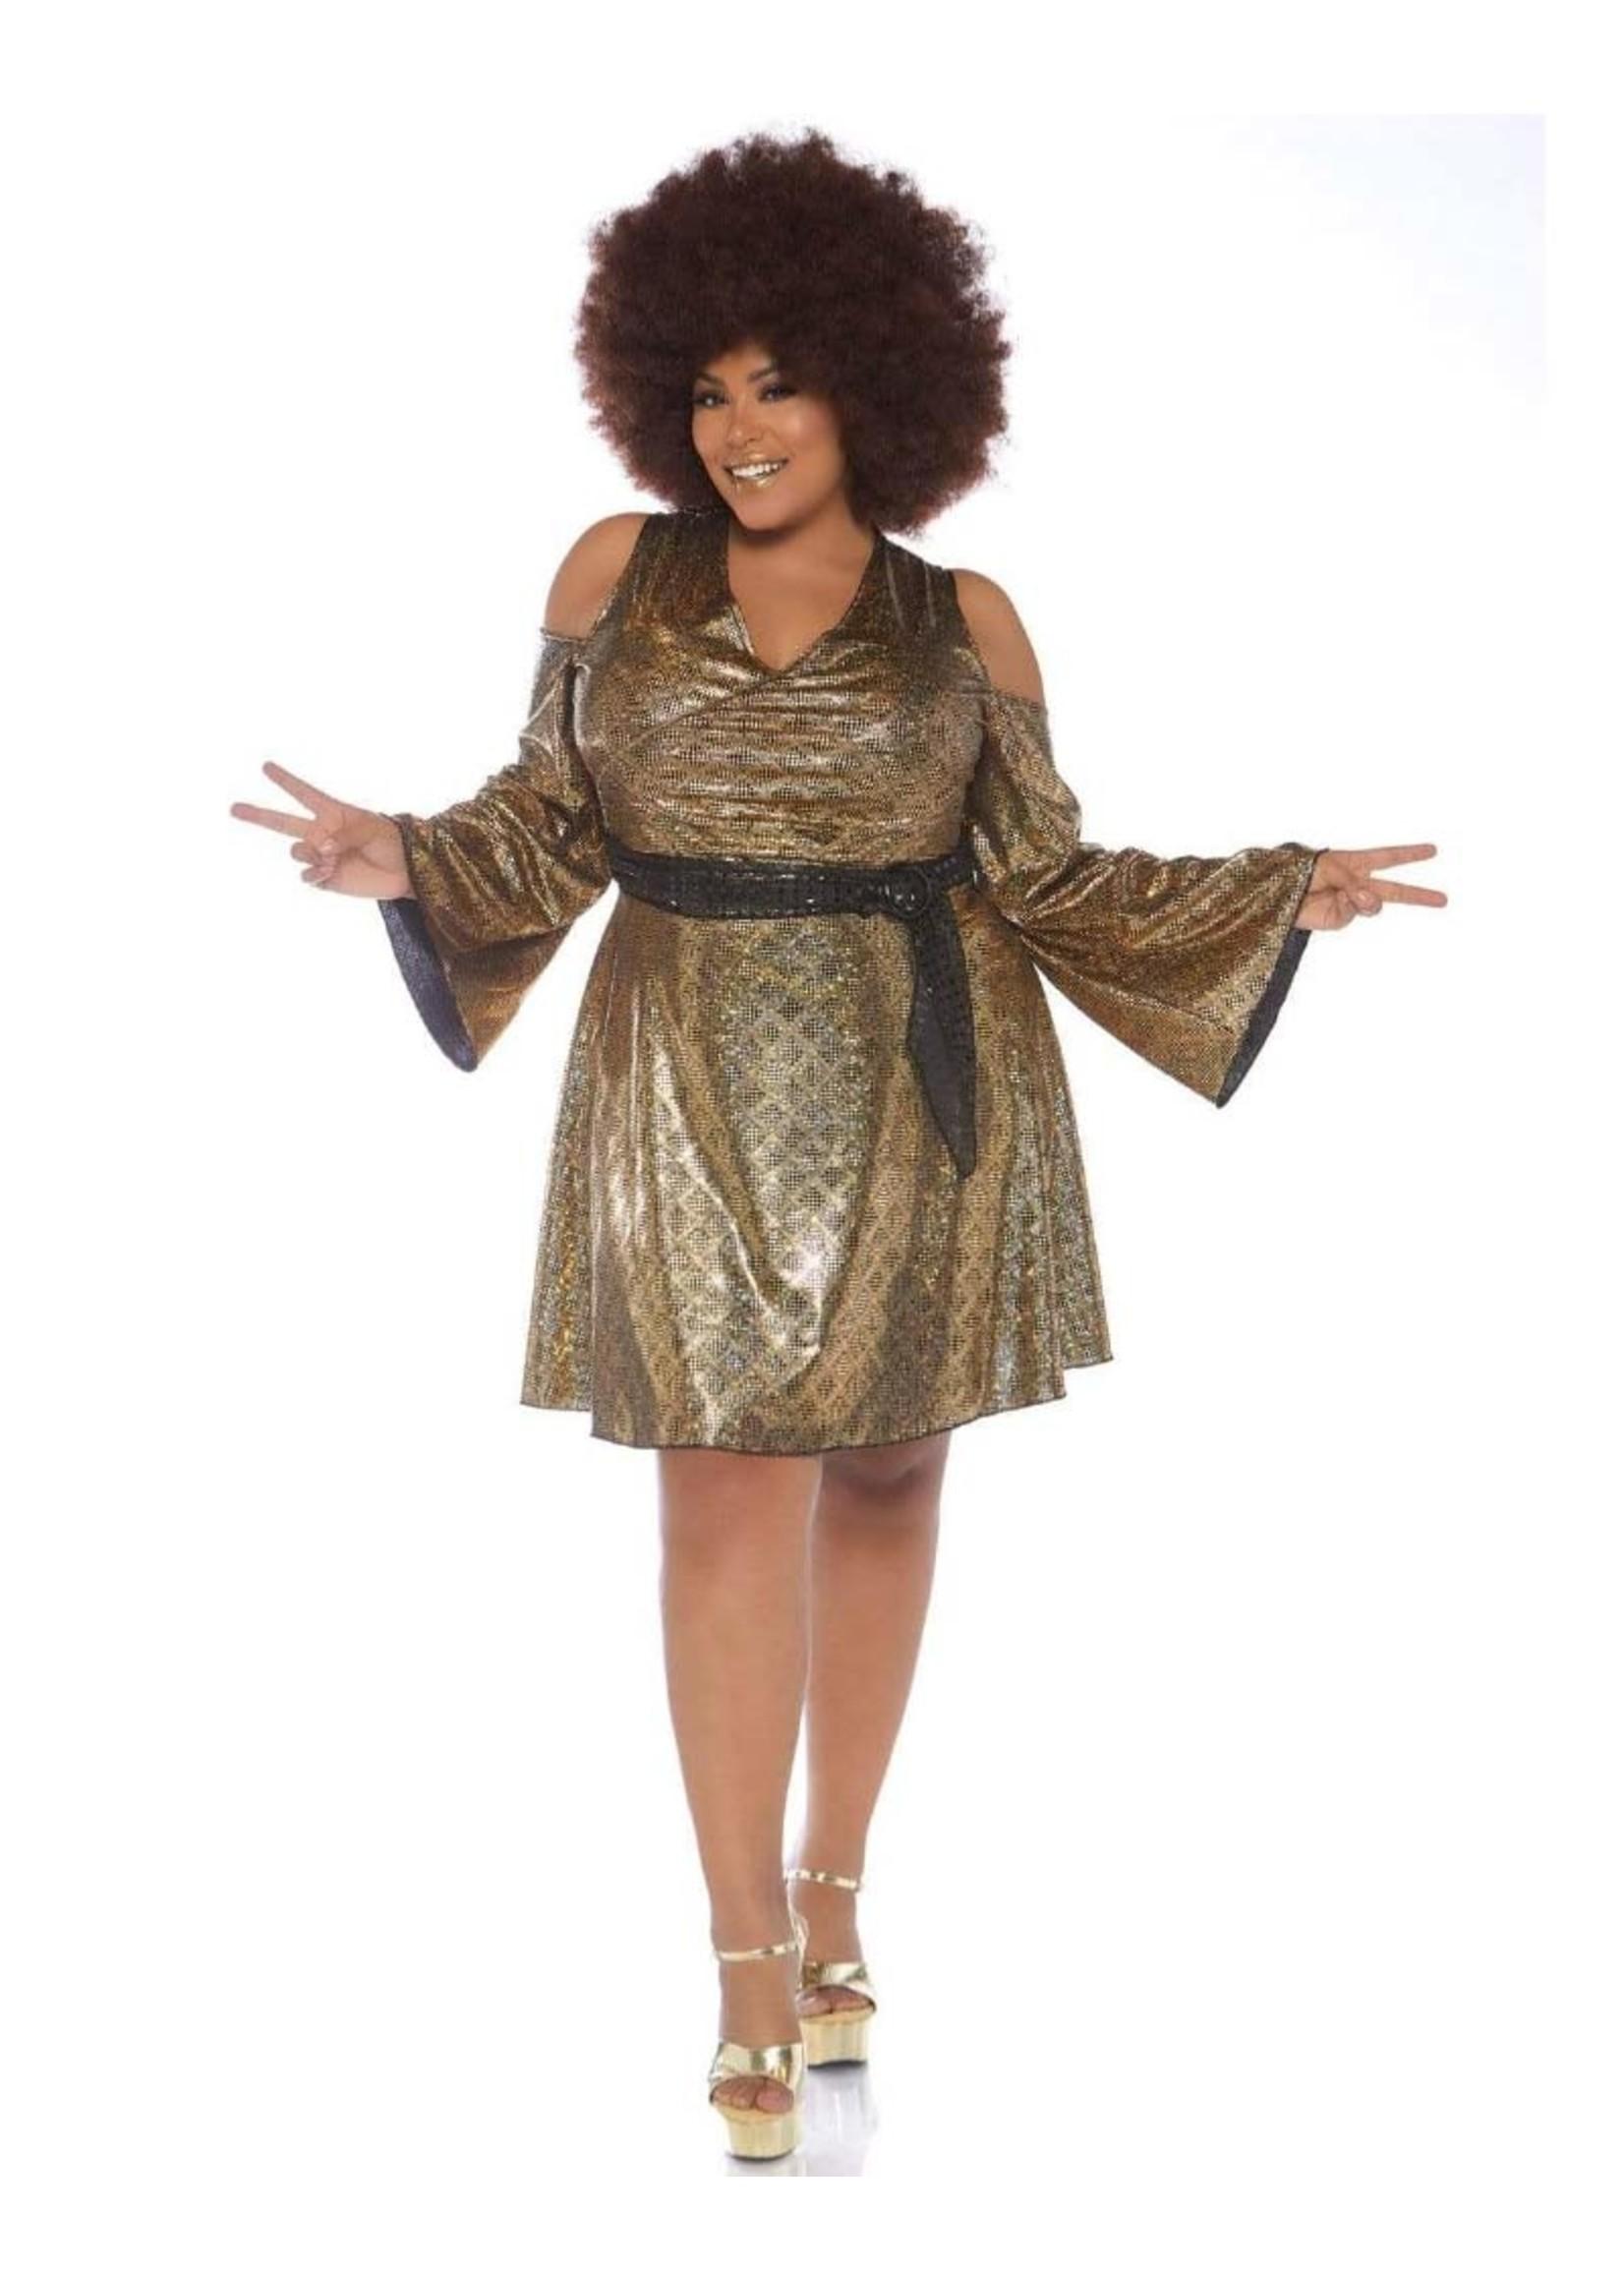 LEG AVENUE 70's Disco Doll - Women's